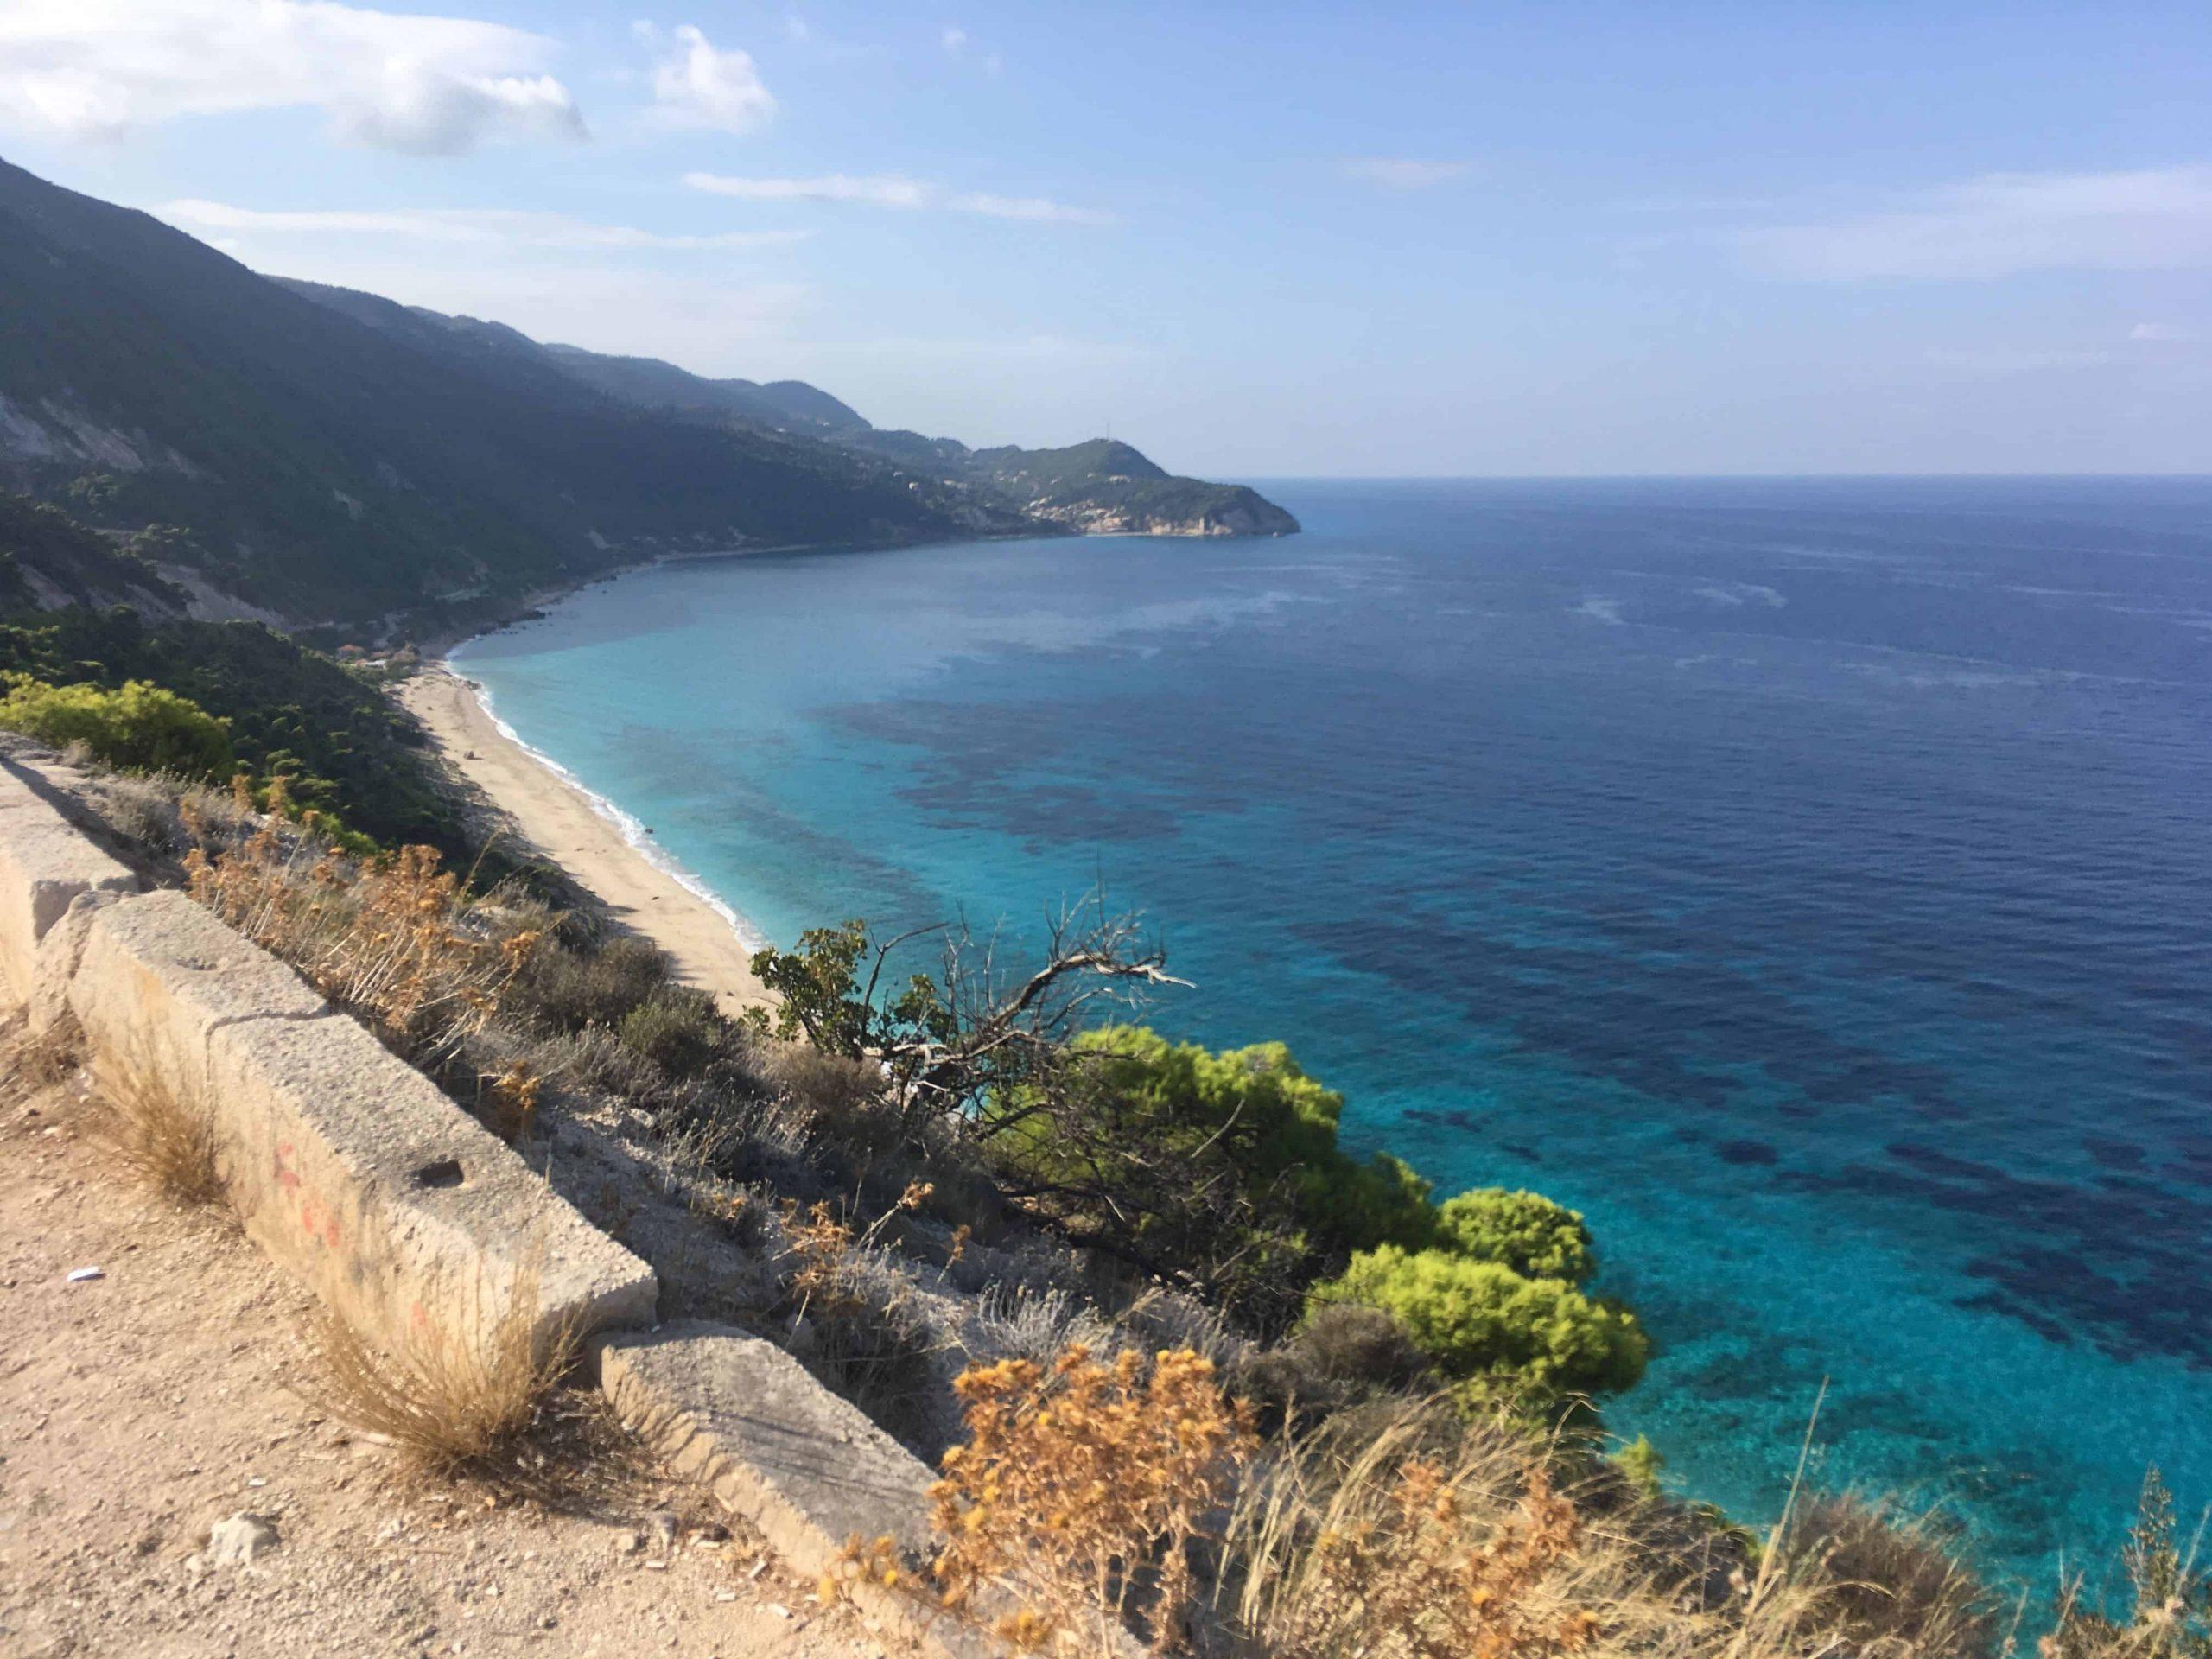 Falaises et mer bleu turquoise!